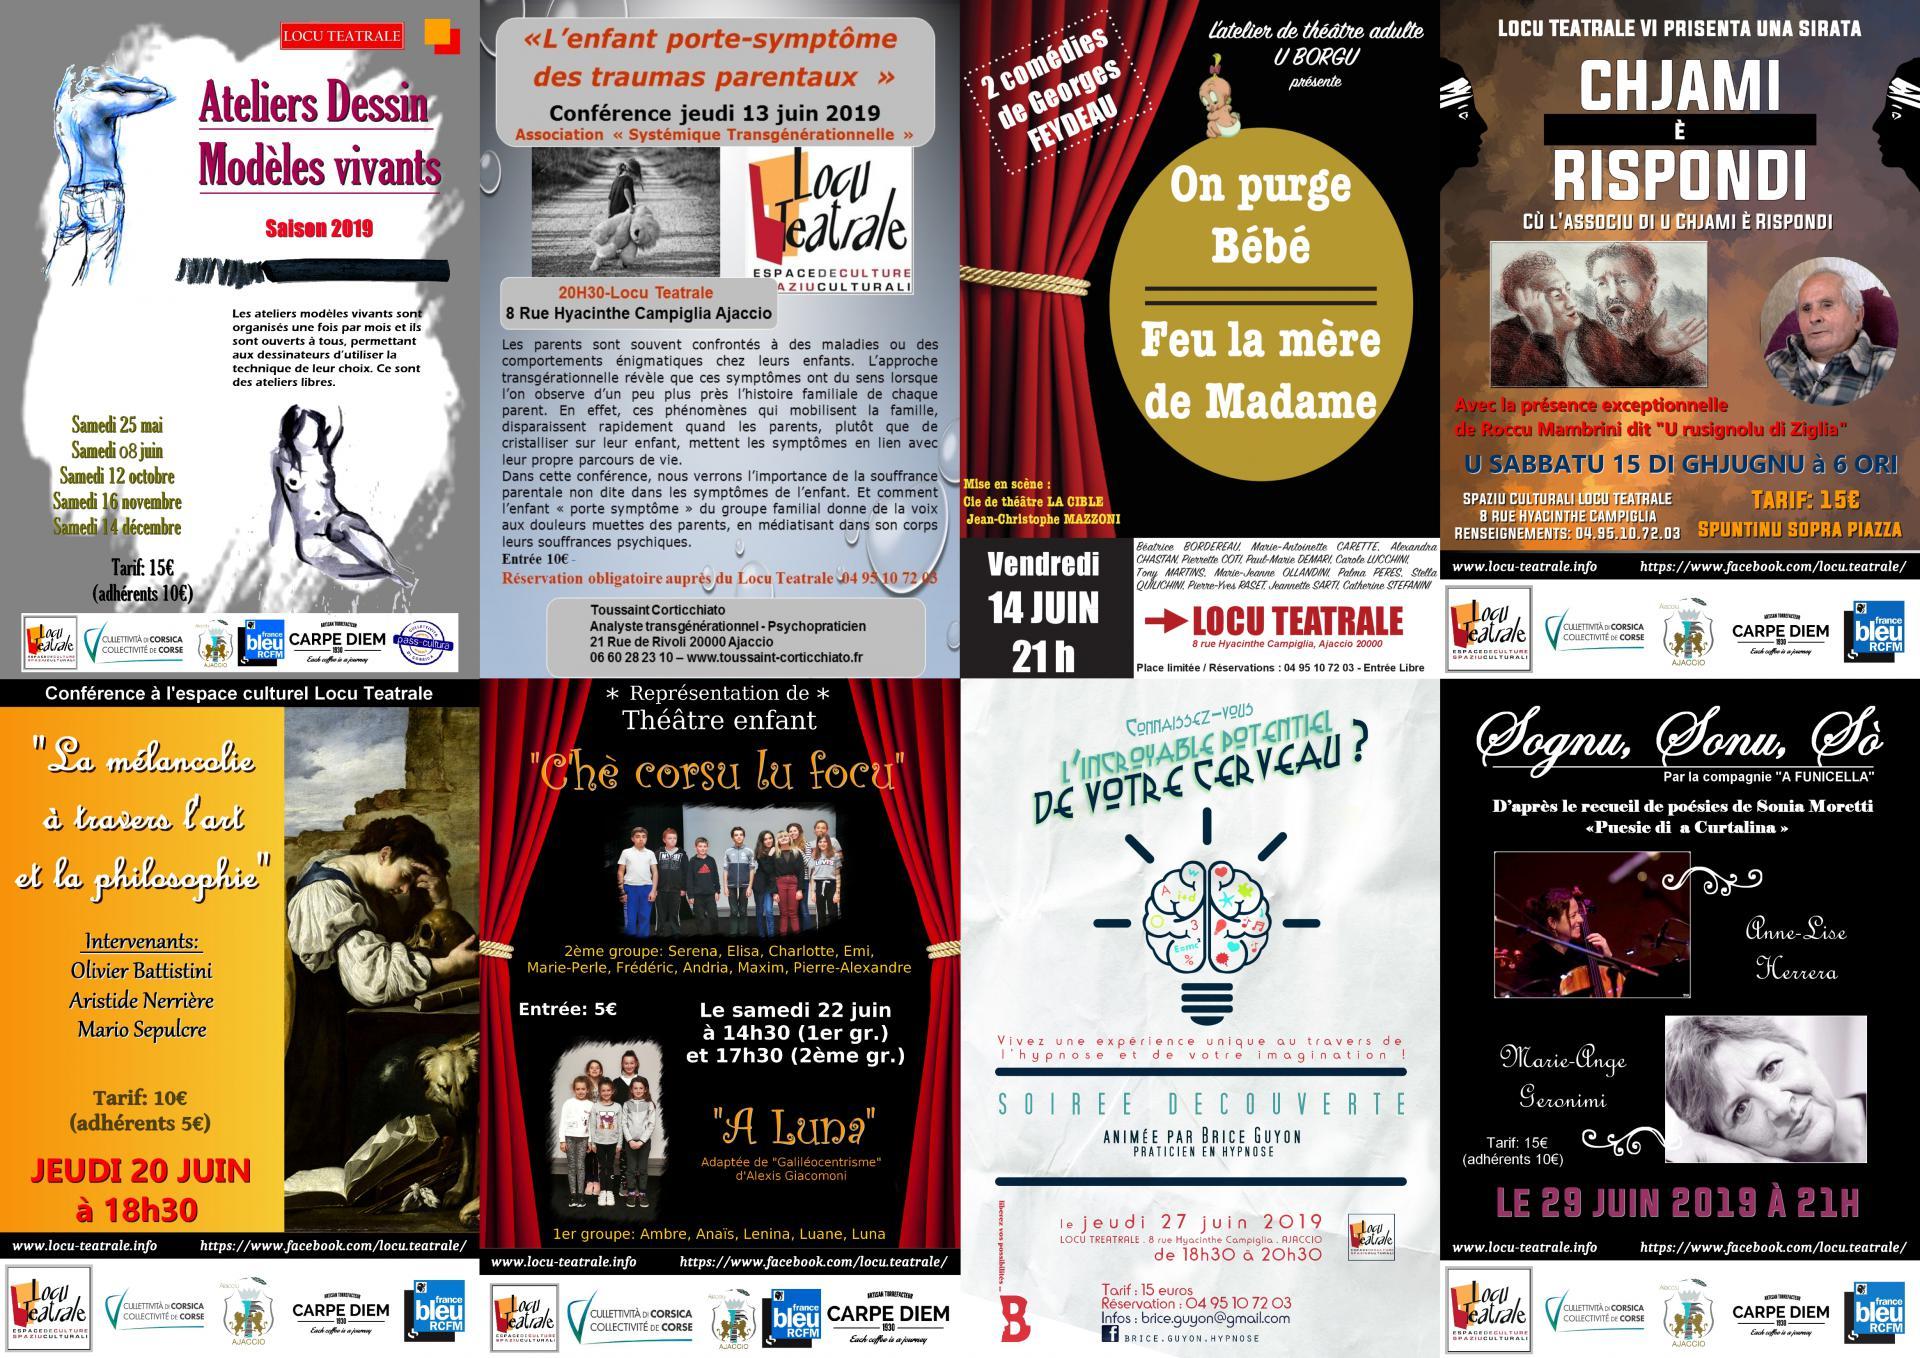 Programme du mois de juin à Locu Teatrale